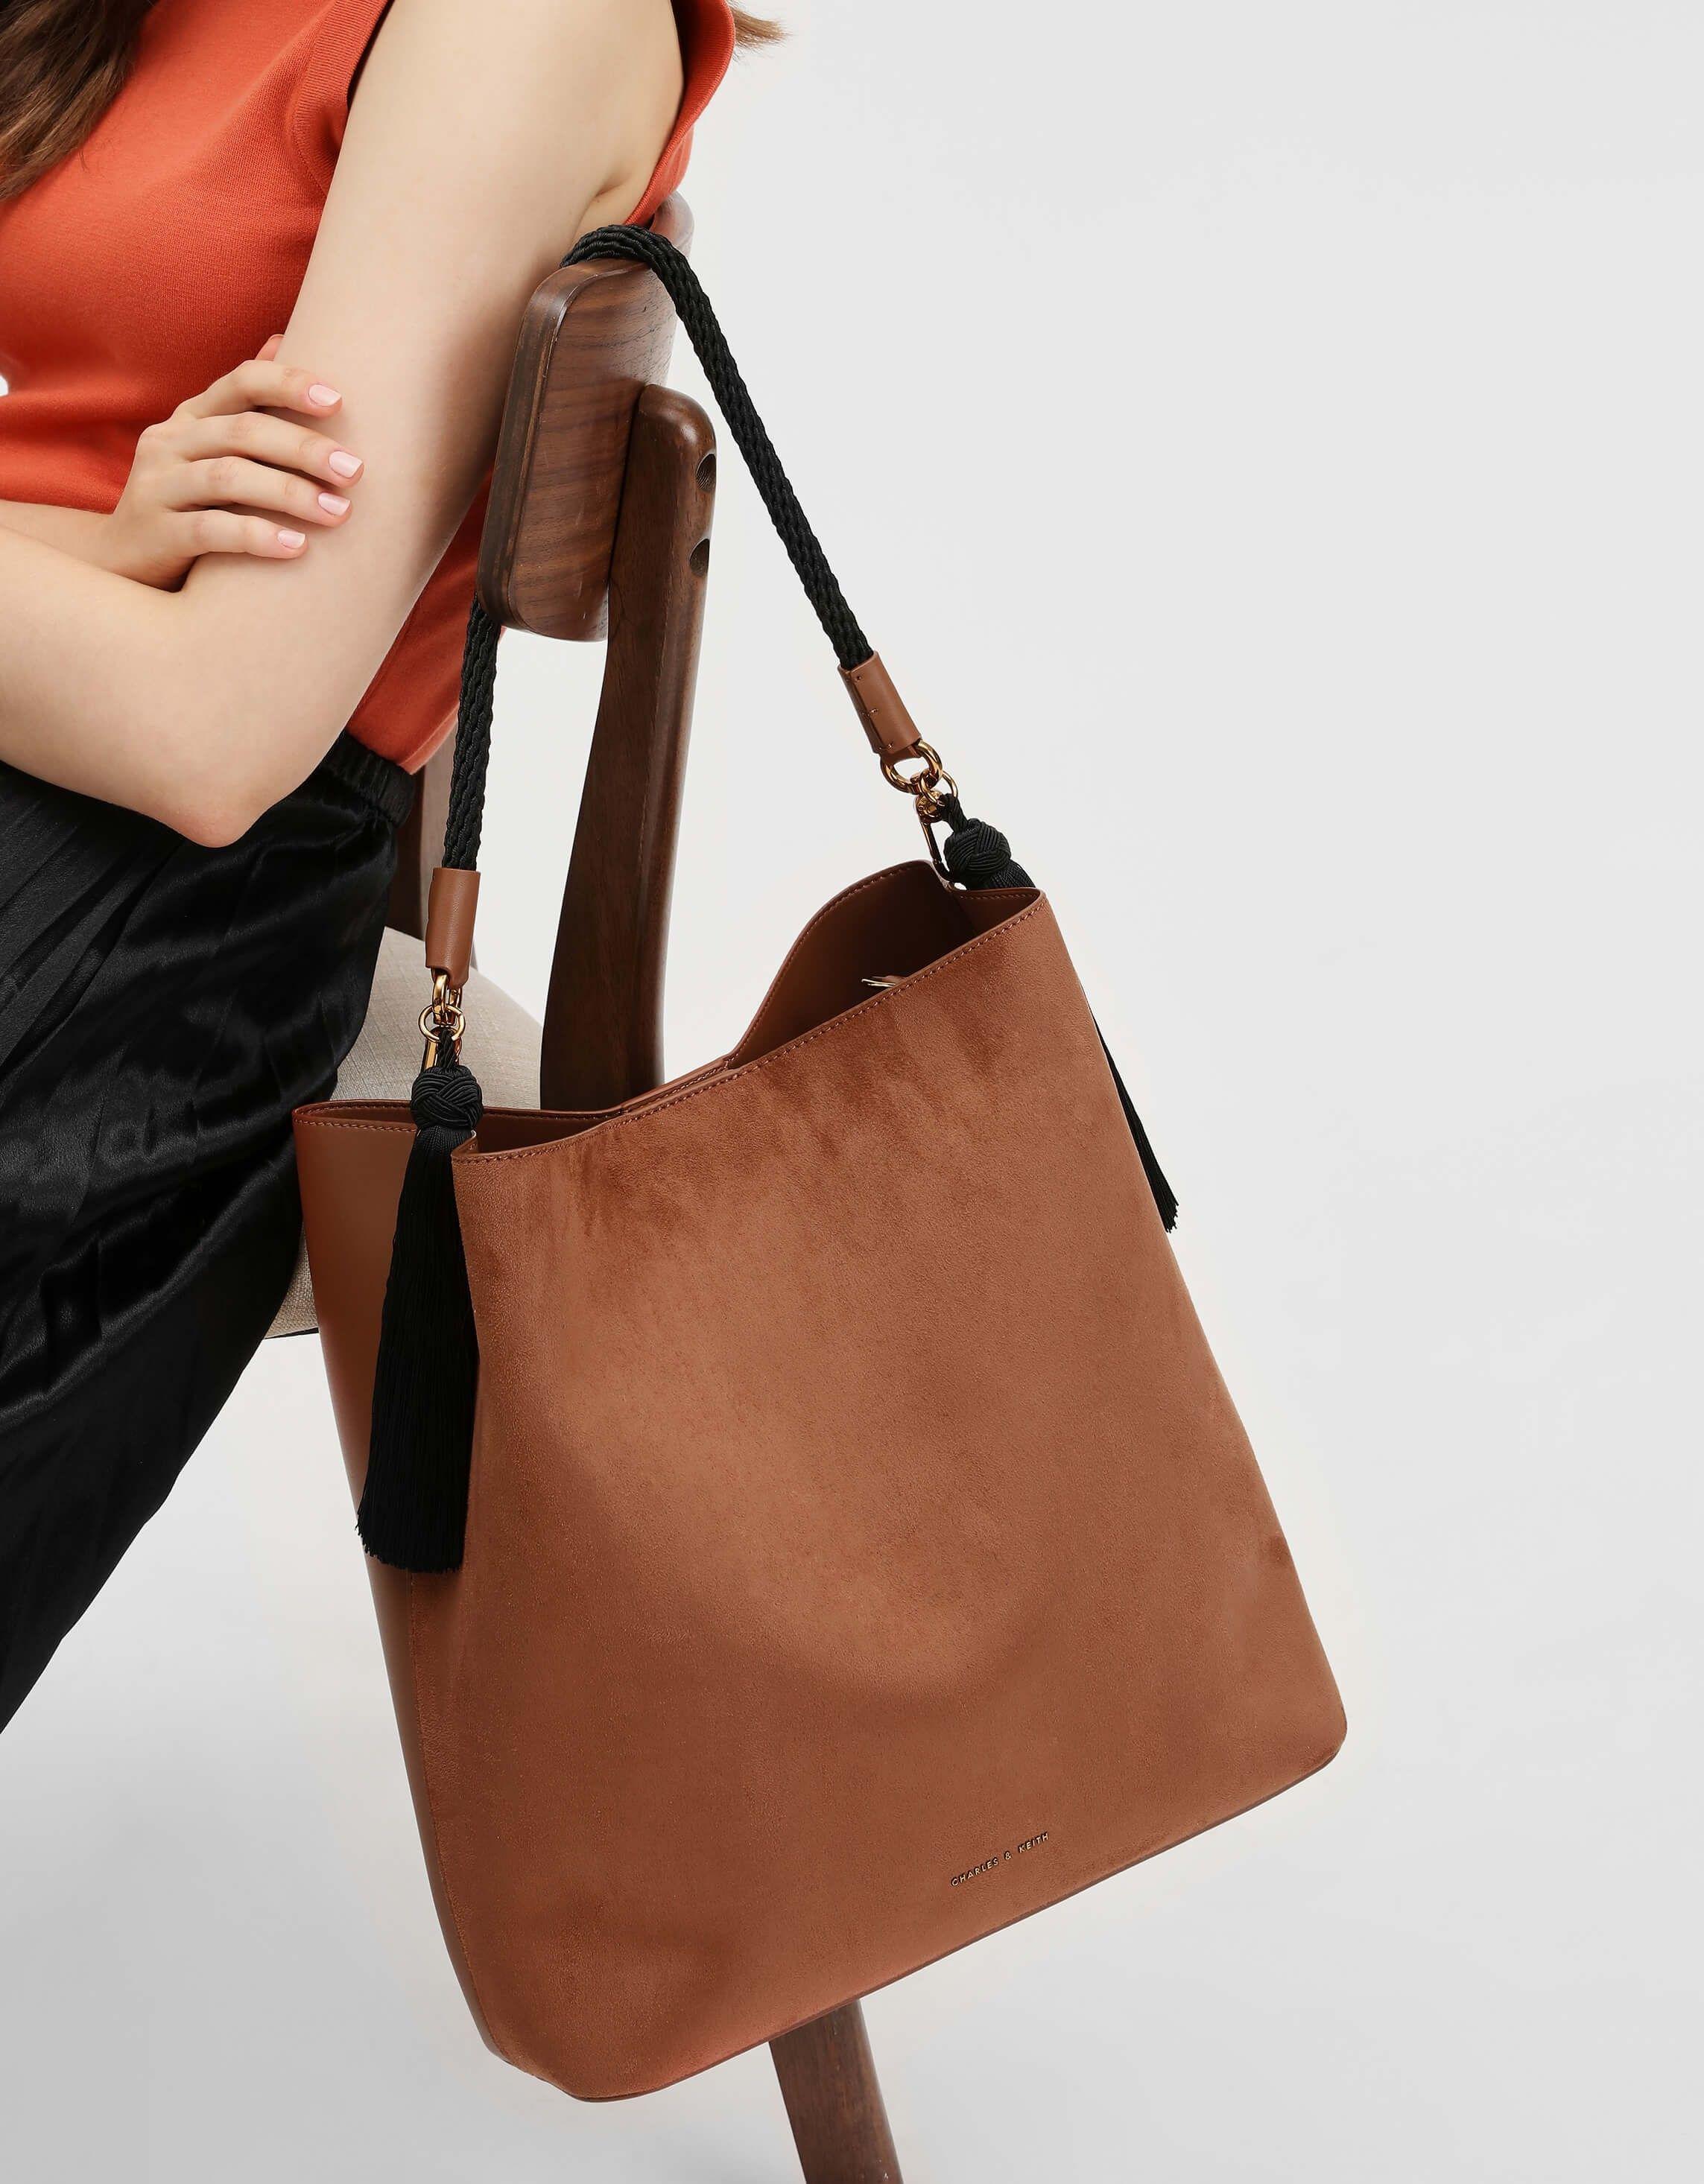 b9611f5d64 Cognac Tassel Detail Oversized Bucket Bag